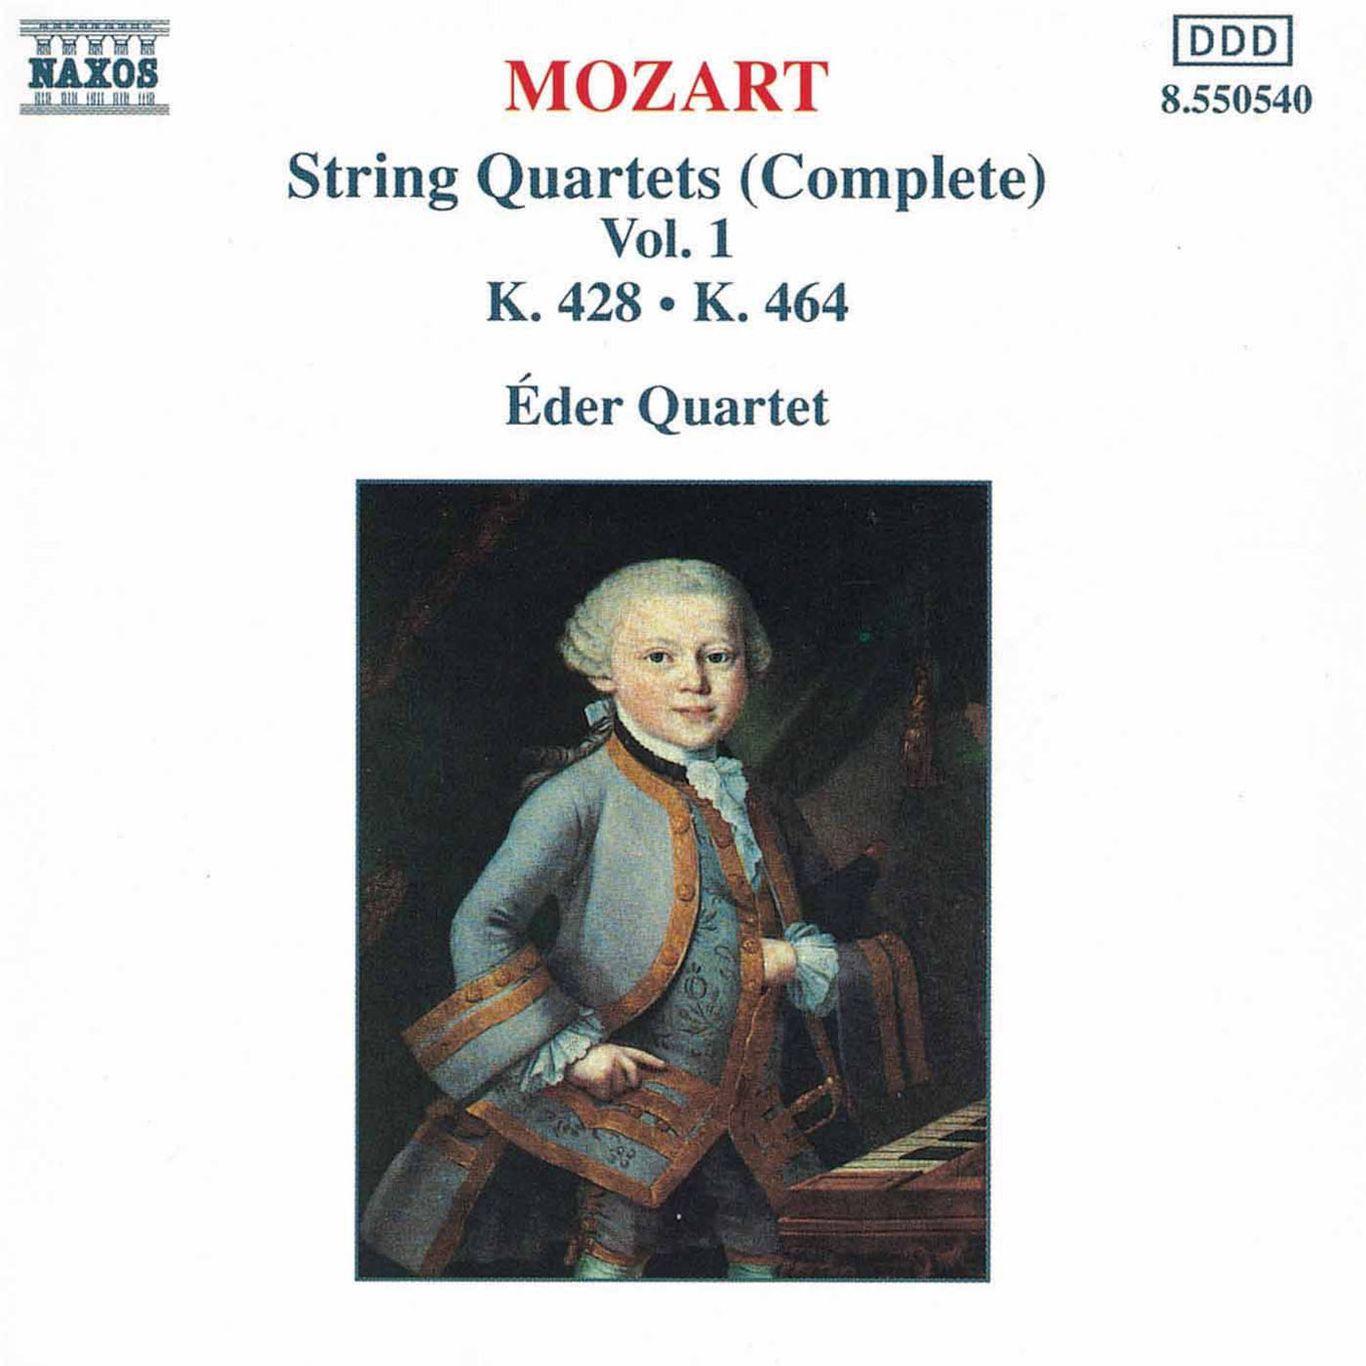 String Quartet No  16 in E-Flat Major, K  428 - II  Andante con moto